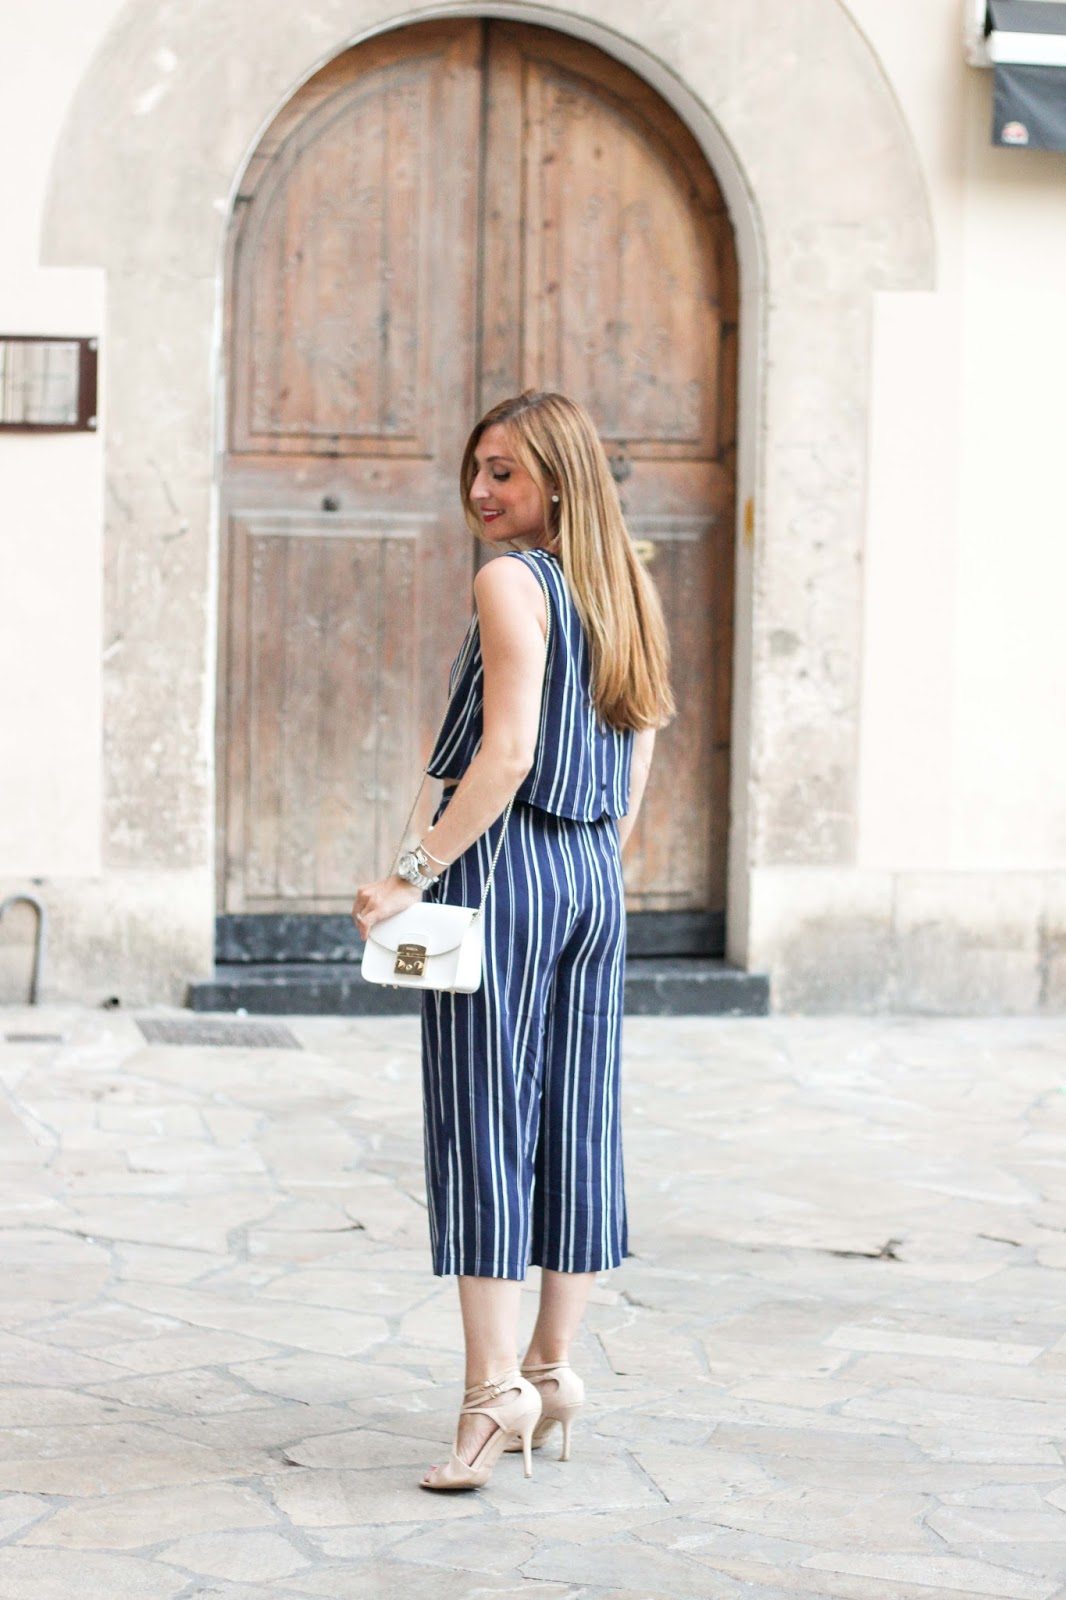 Fashionstylebyjohanna - Blogger aus Frankfurt - Frankfurt Fashionblogger - Zweiteiler - Sommertrend 2016 - c&A- C&A looks Blogger - Blogger Trens 2016